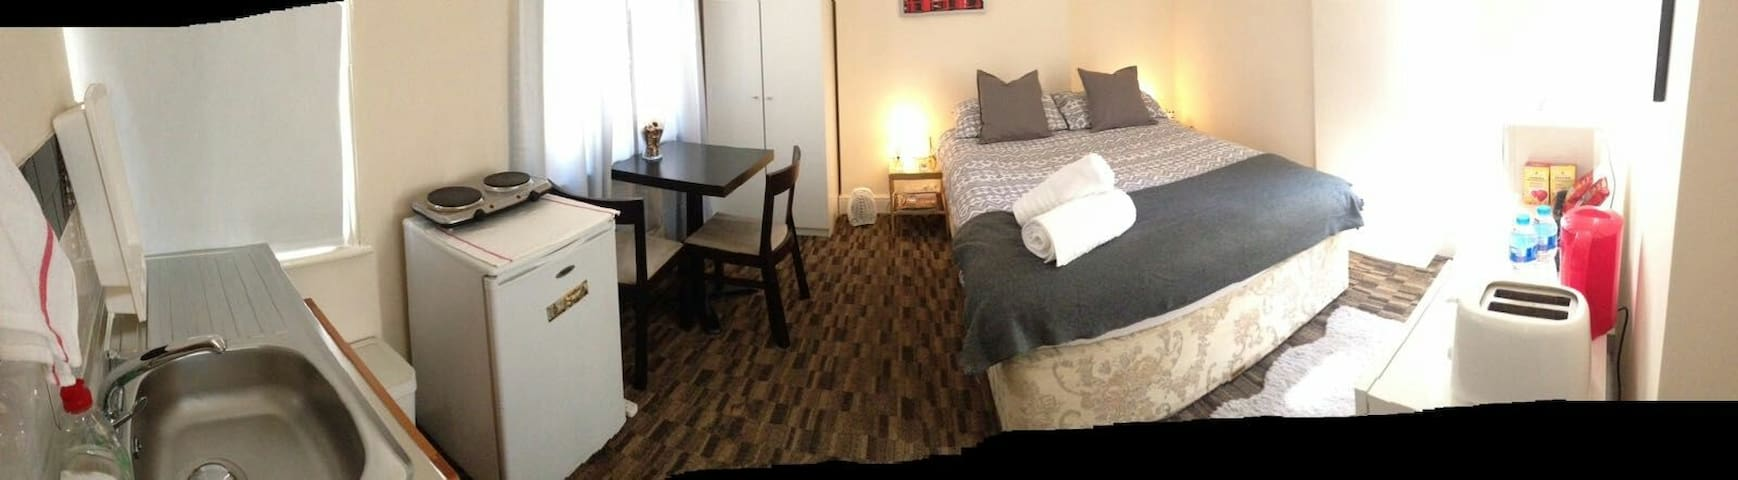 Entire suite flat near Paddington Station - London - Apartmen